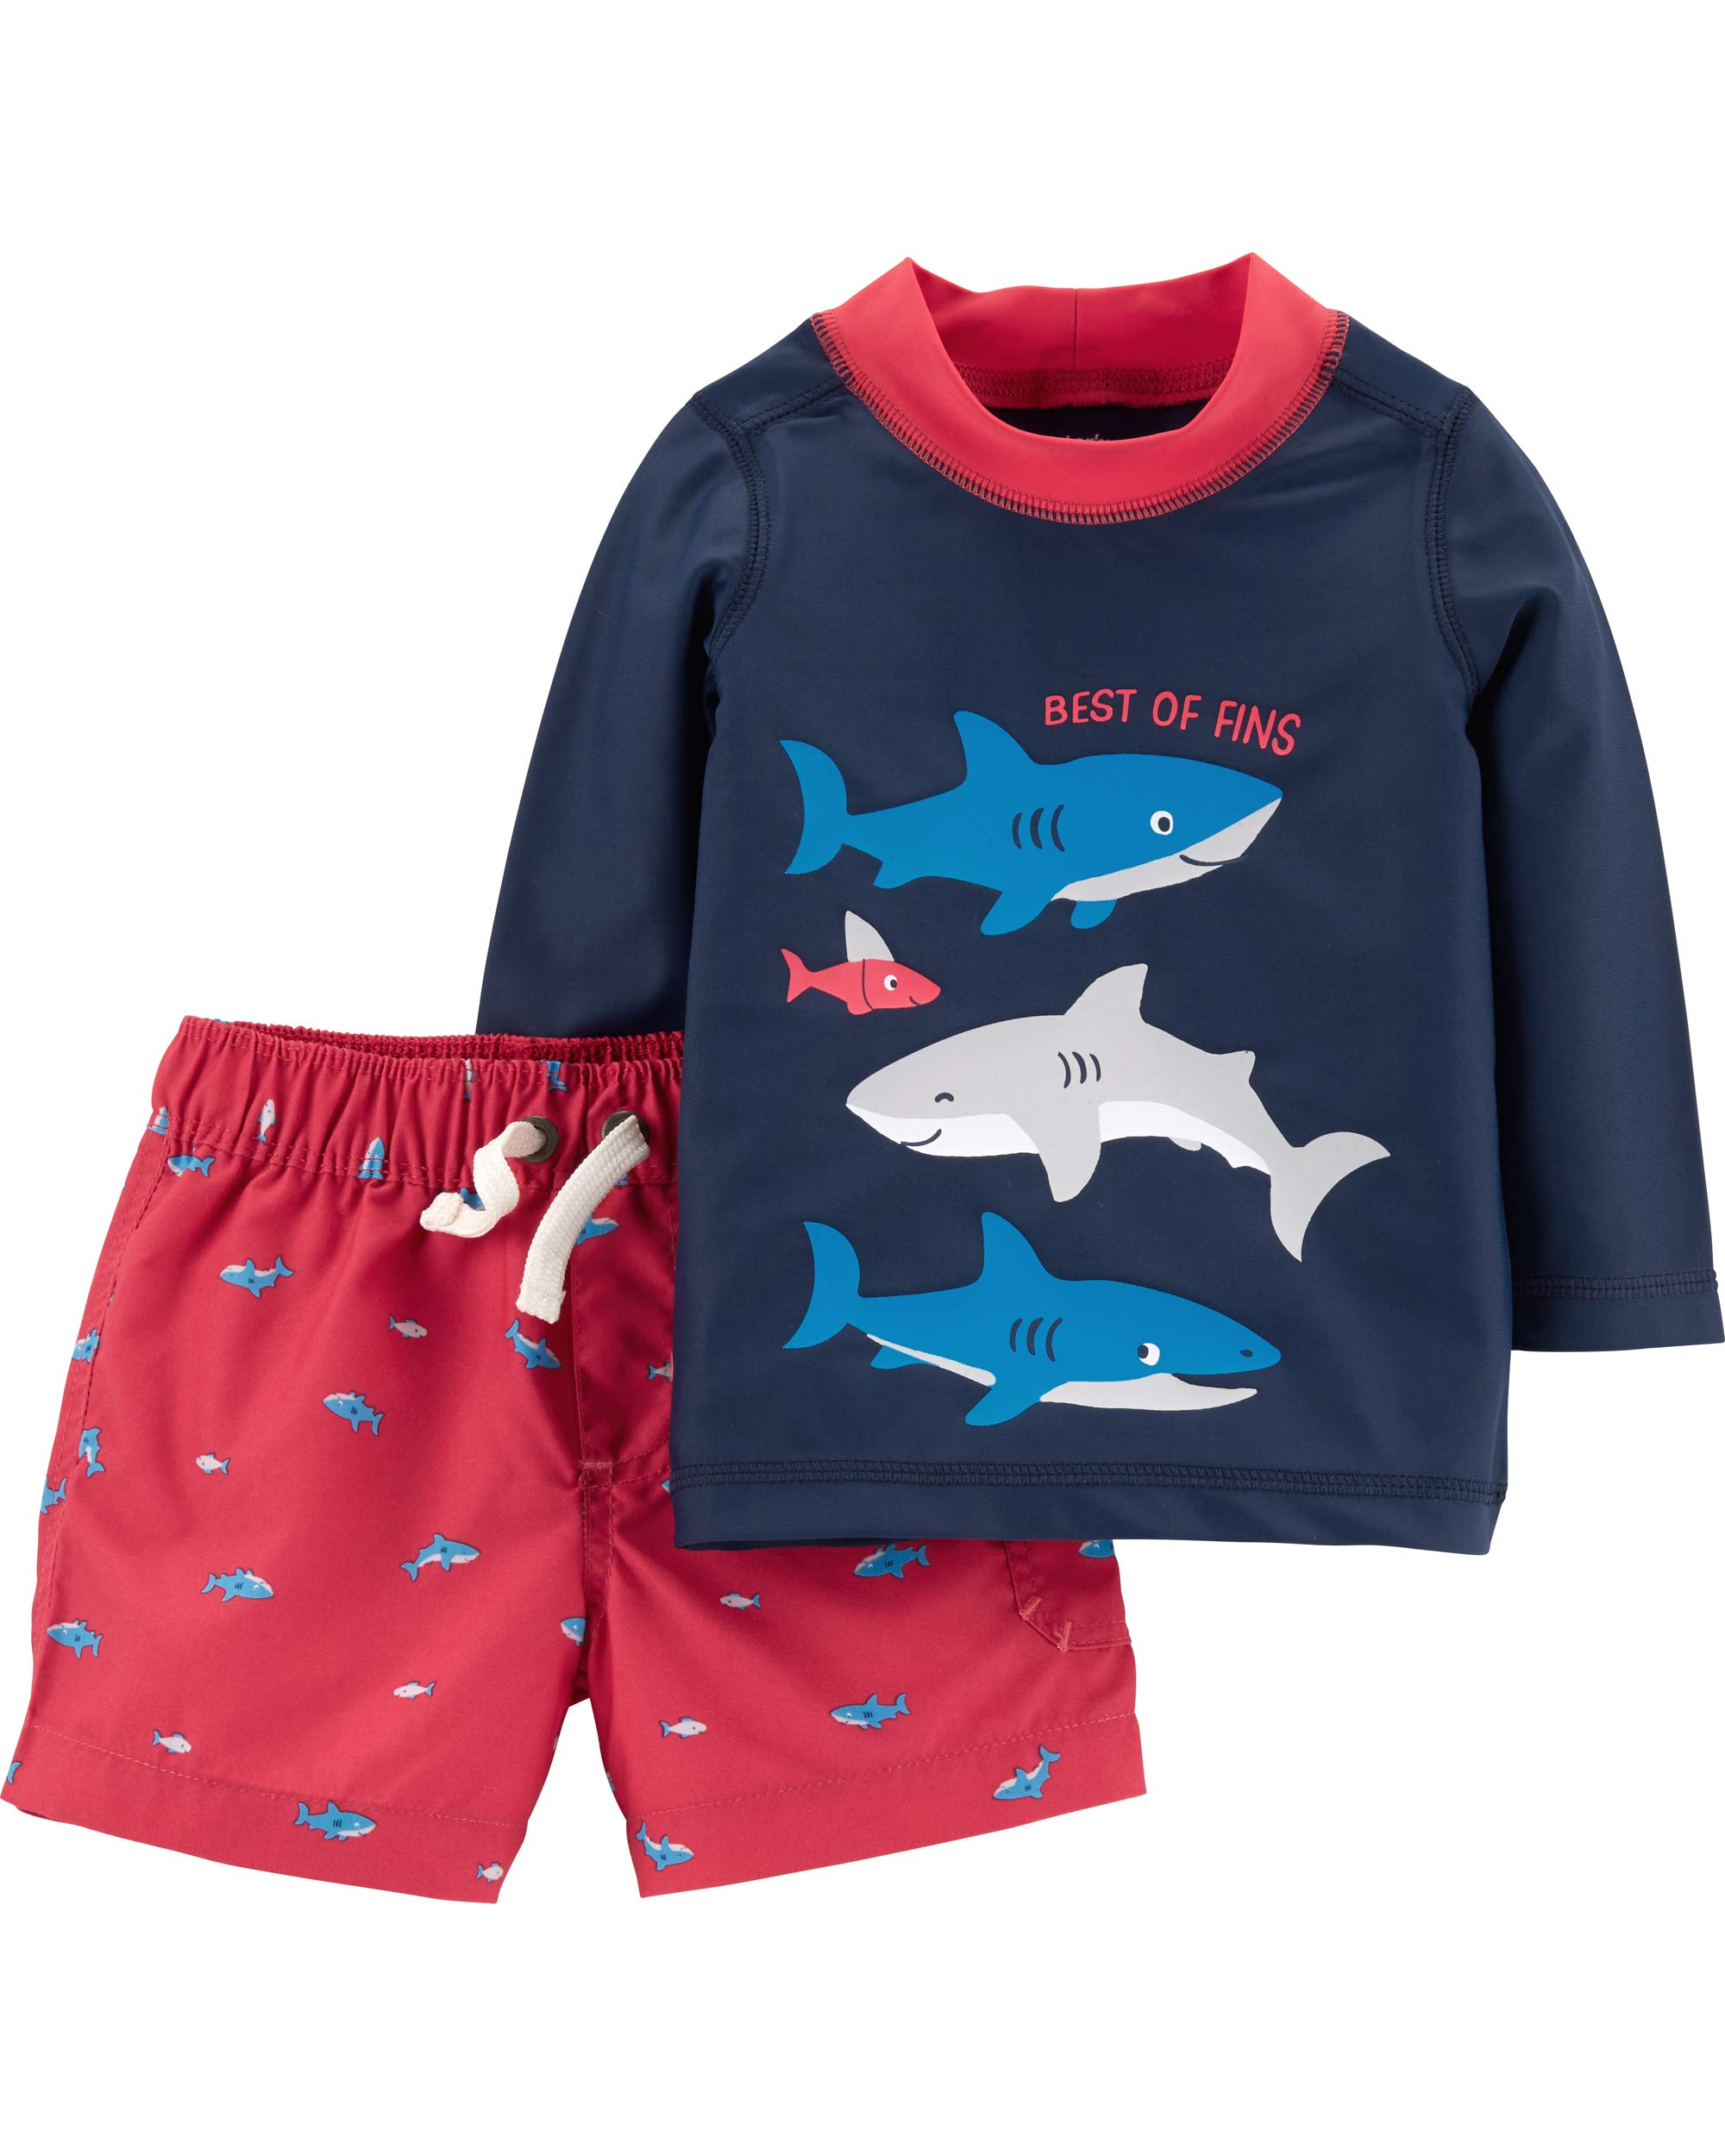 Carter's Baby Boys Rashguard Swim Set, Shark, 18